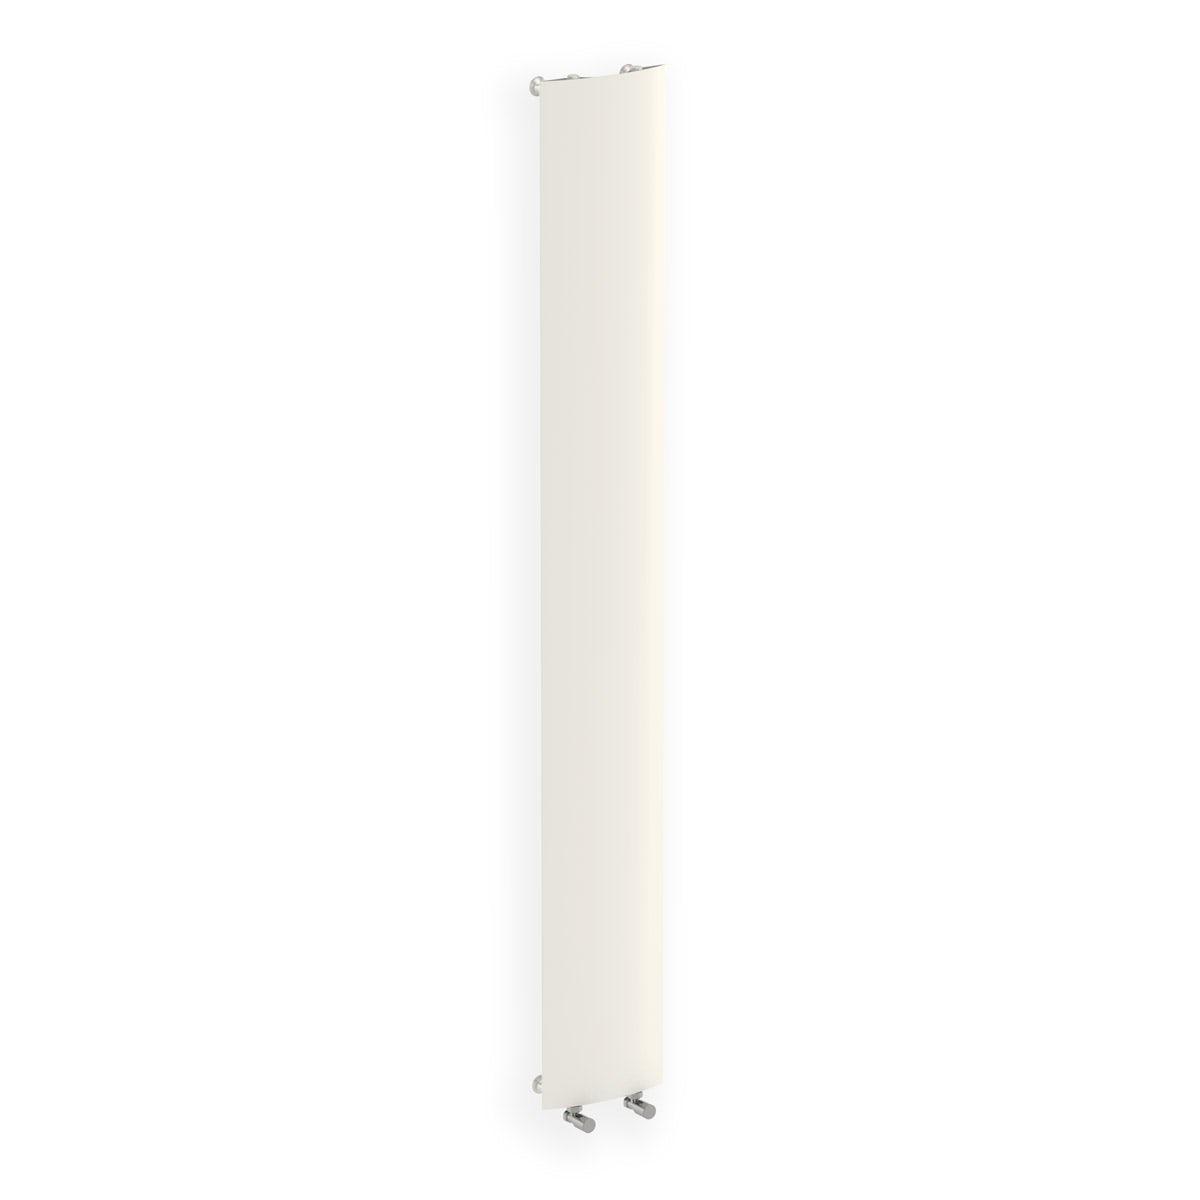 Mode Korlea white vertical radiator 2000 x 280